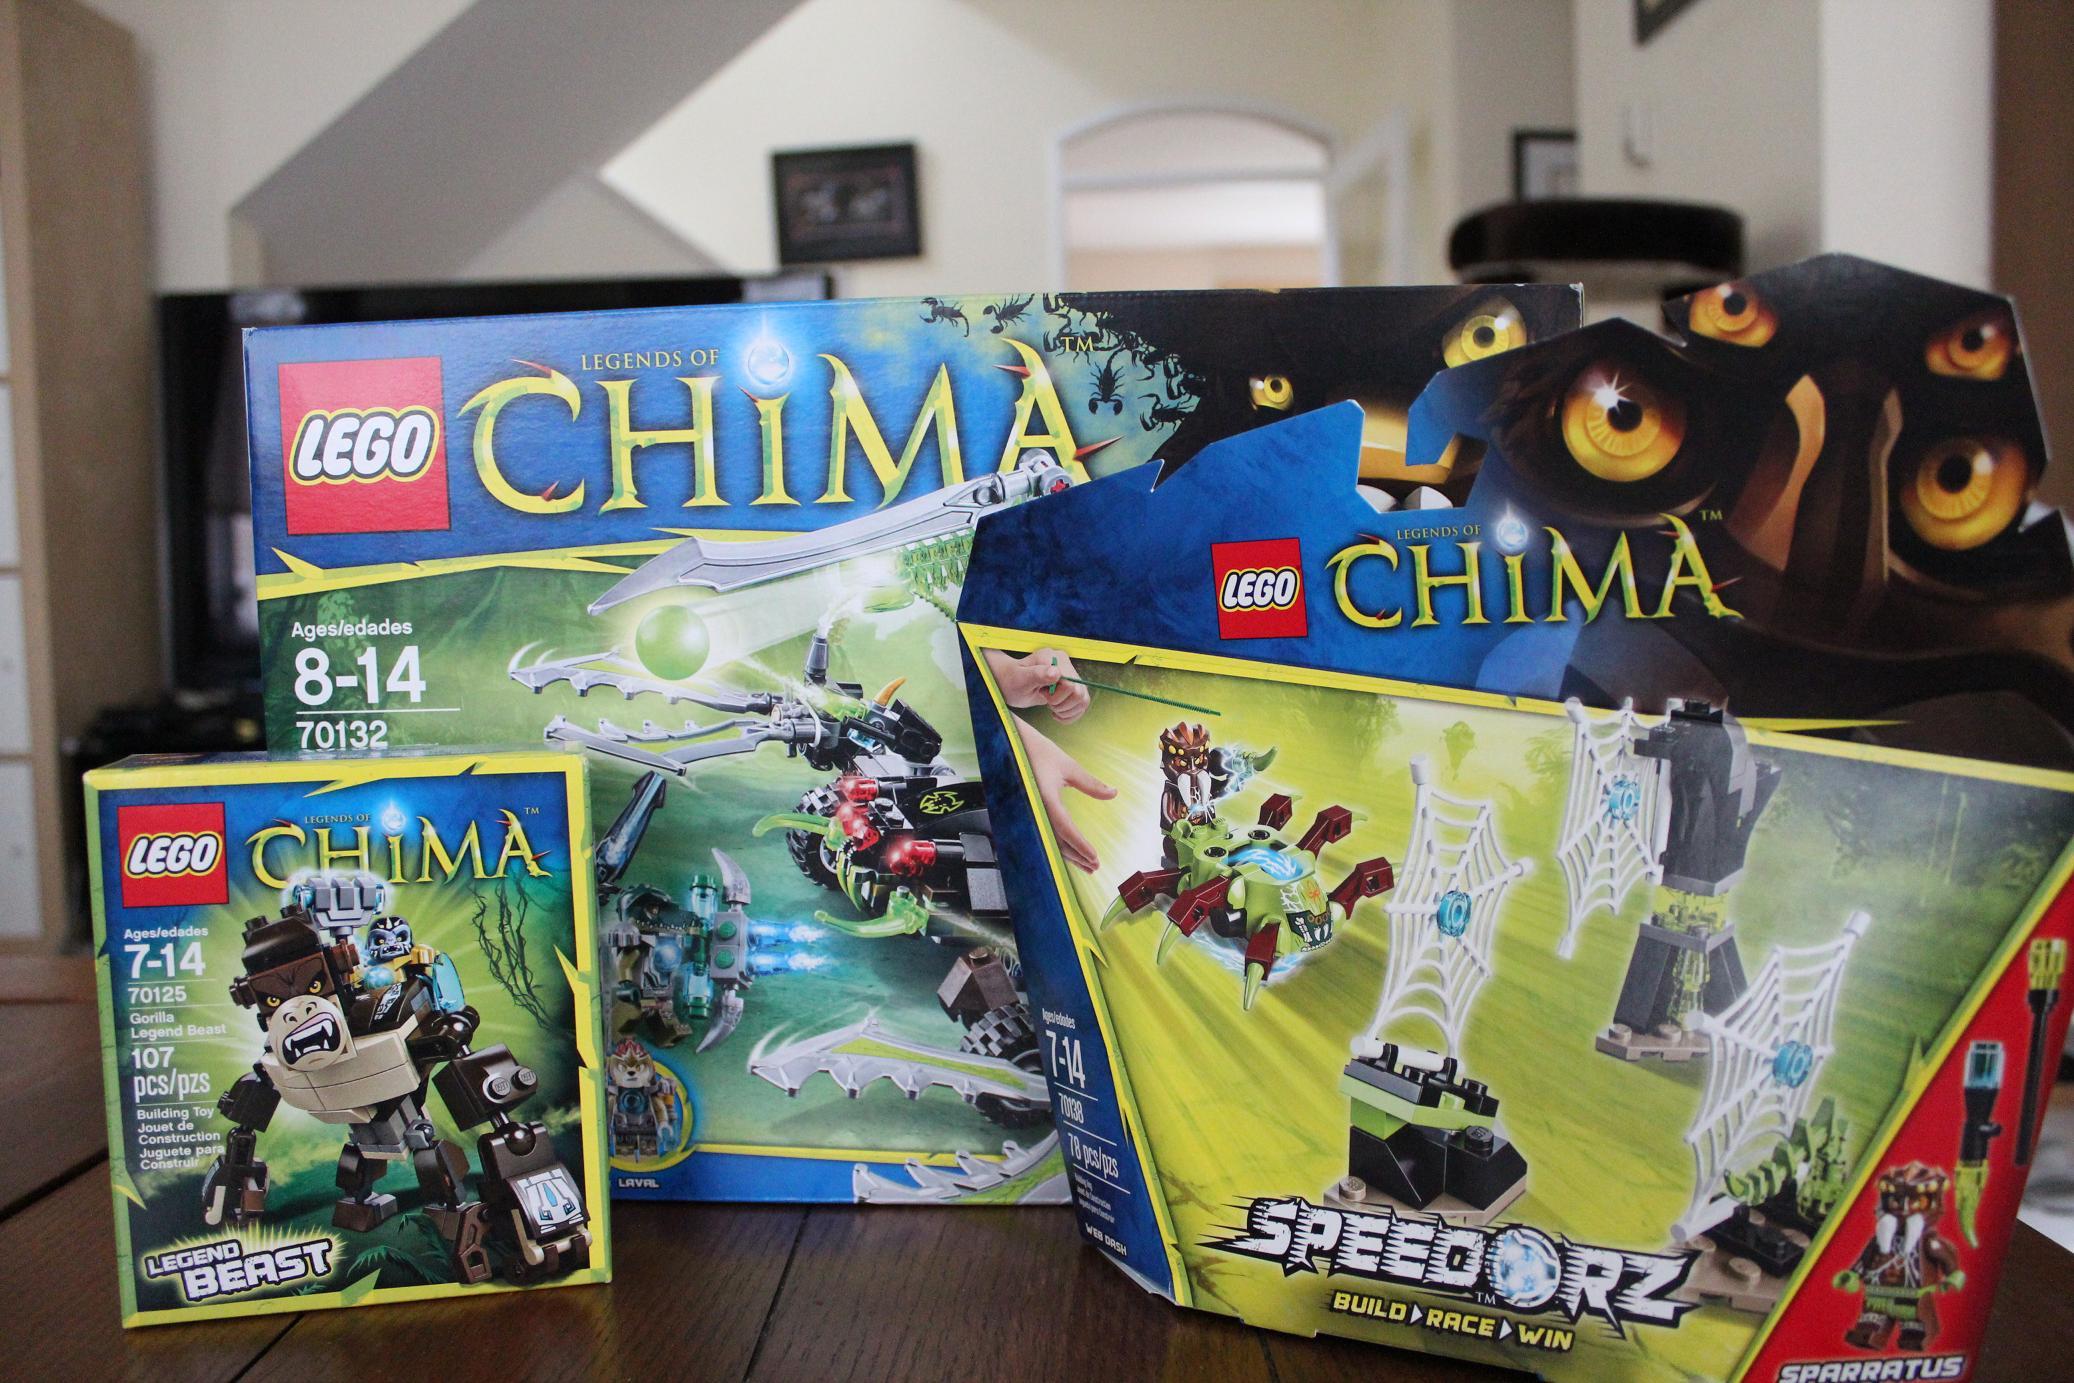 LEGO chima assortment.jpg